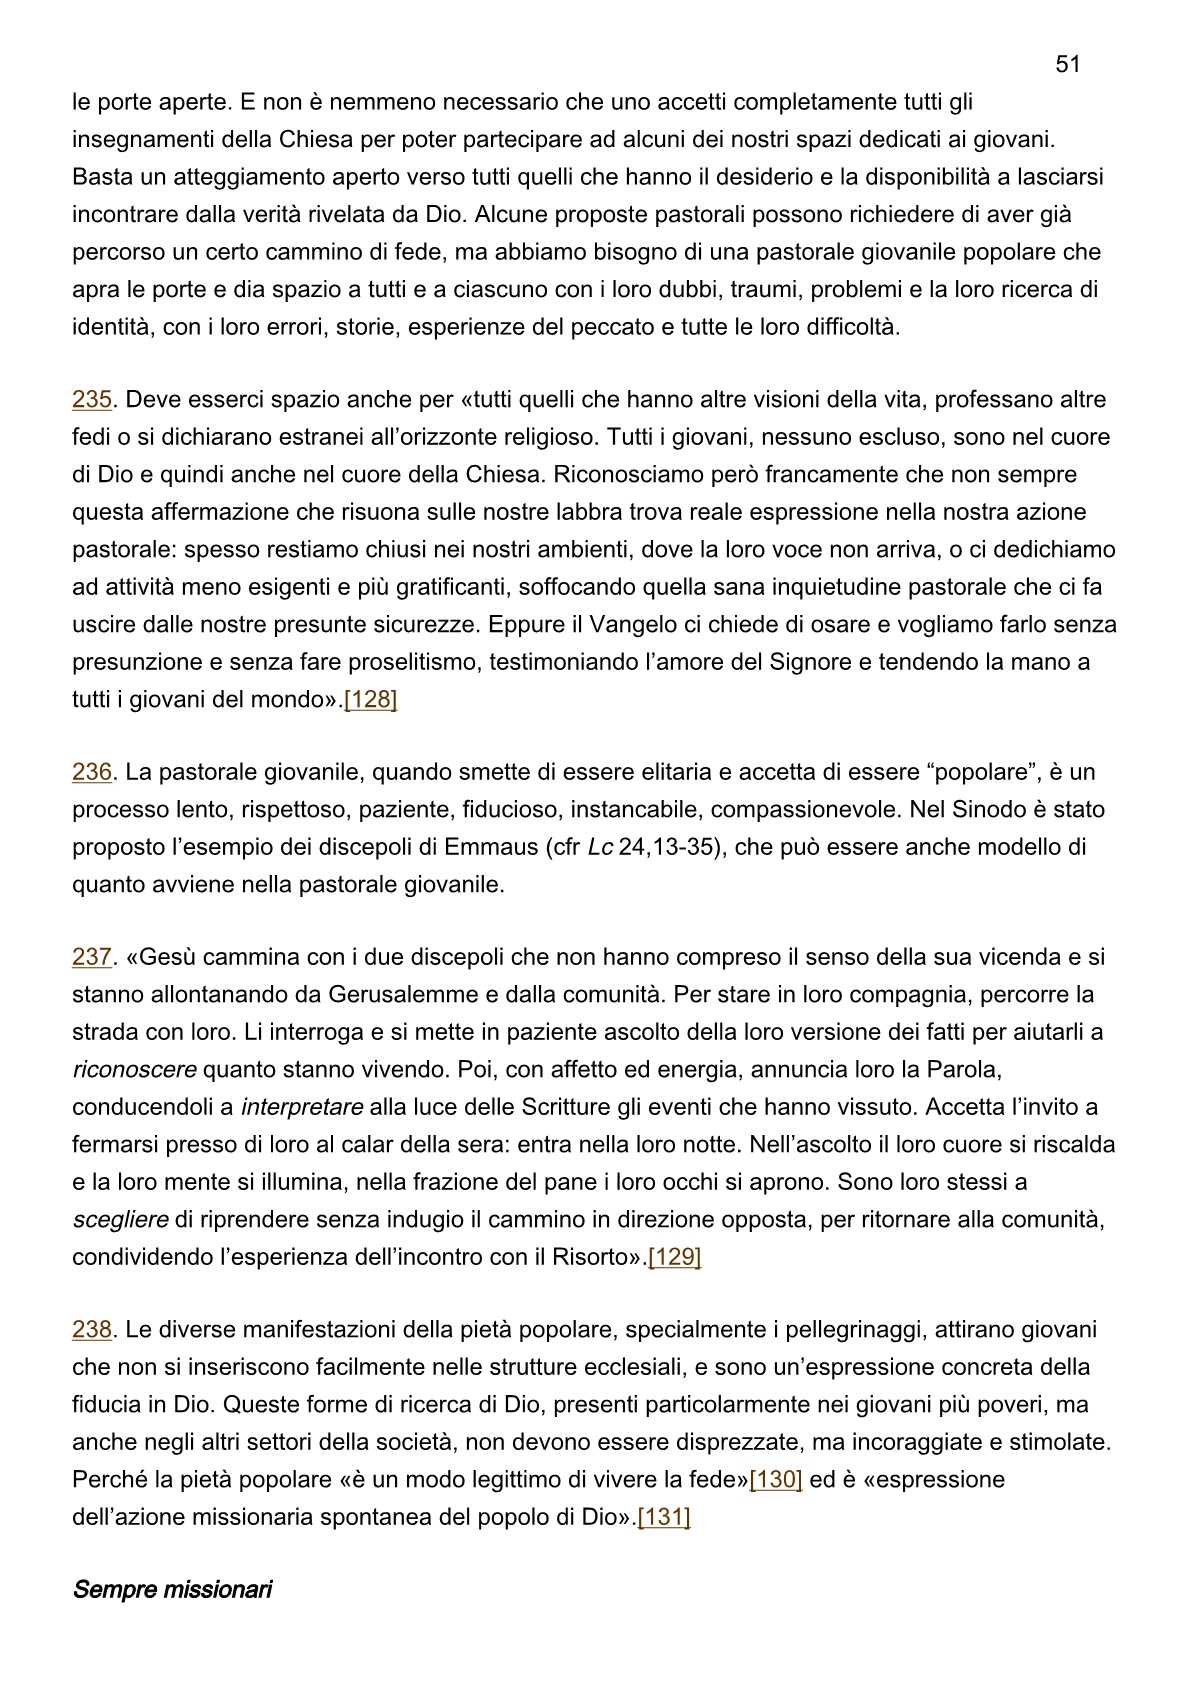 papa-francesco_esortazione-ap_20190325_christus-vivit51